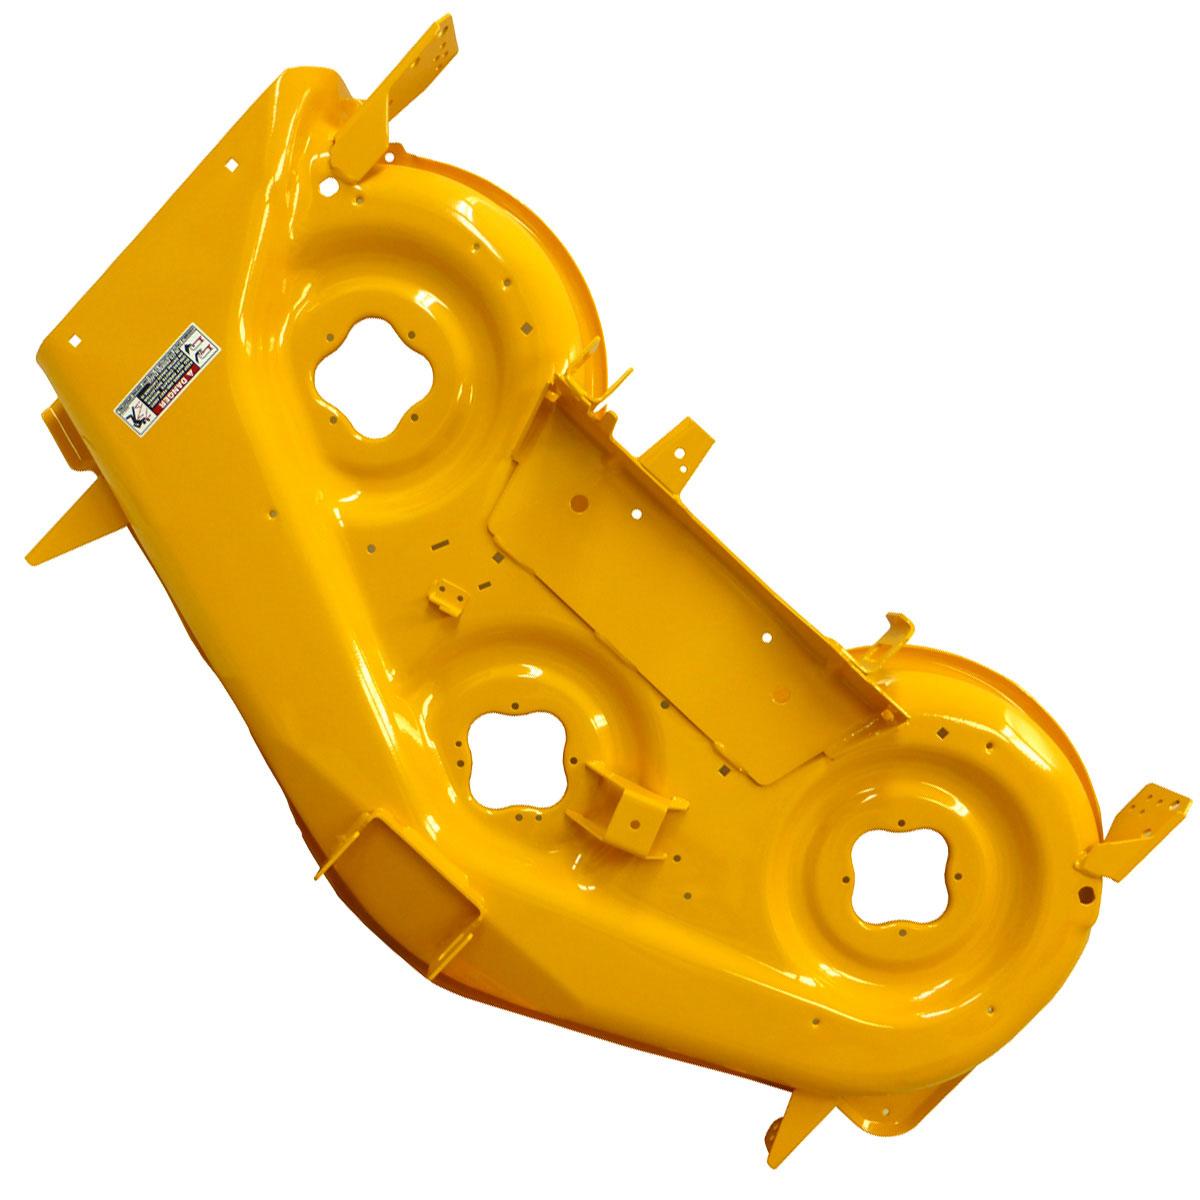 Cub Cadet Deck Shell 903-04328C-0716 | Power Mower Sales